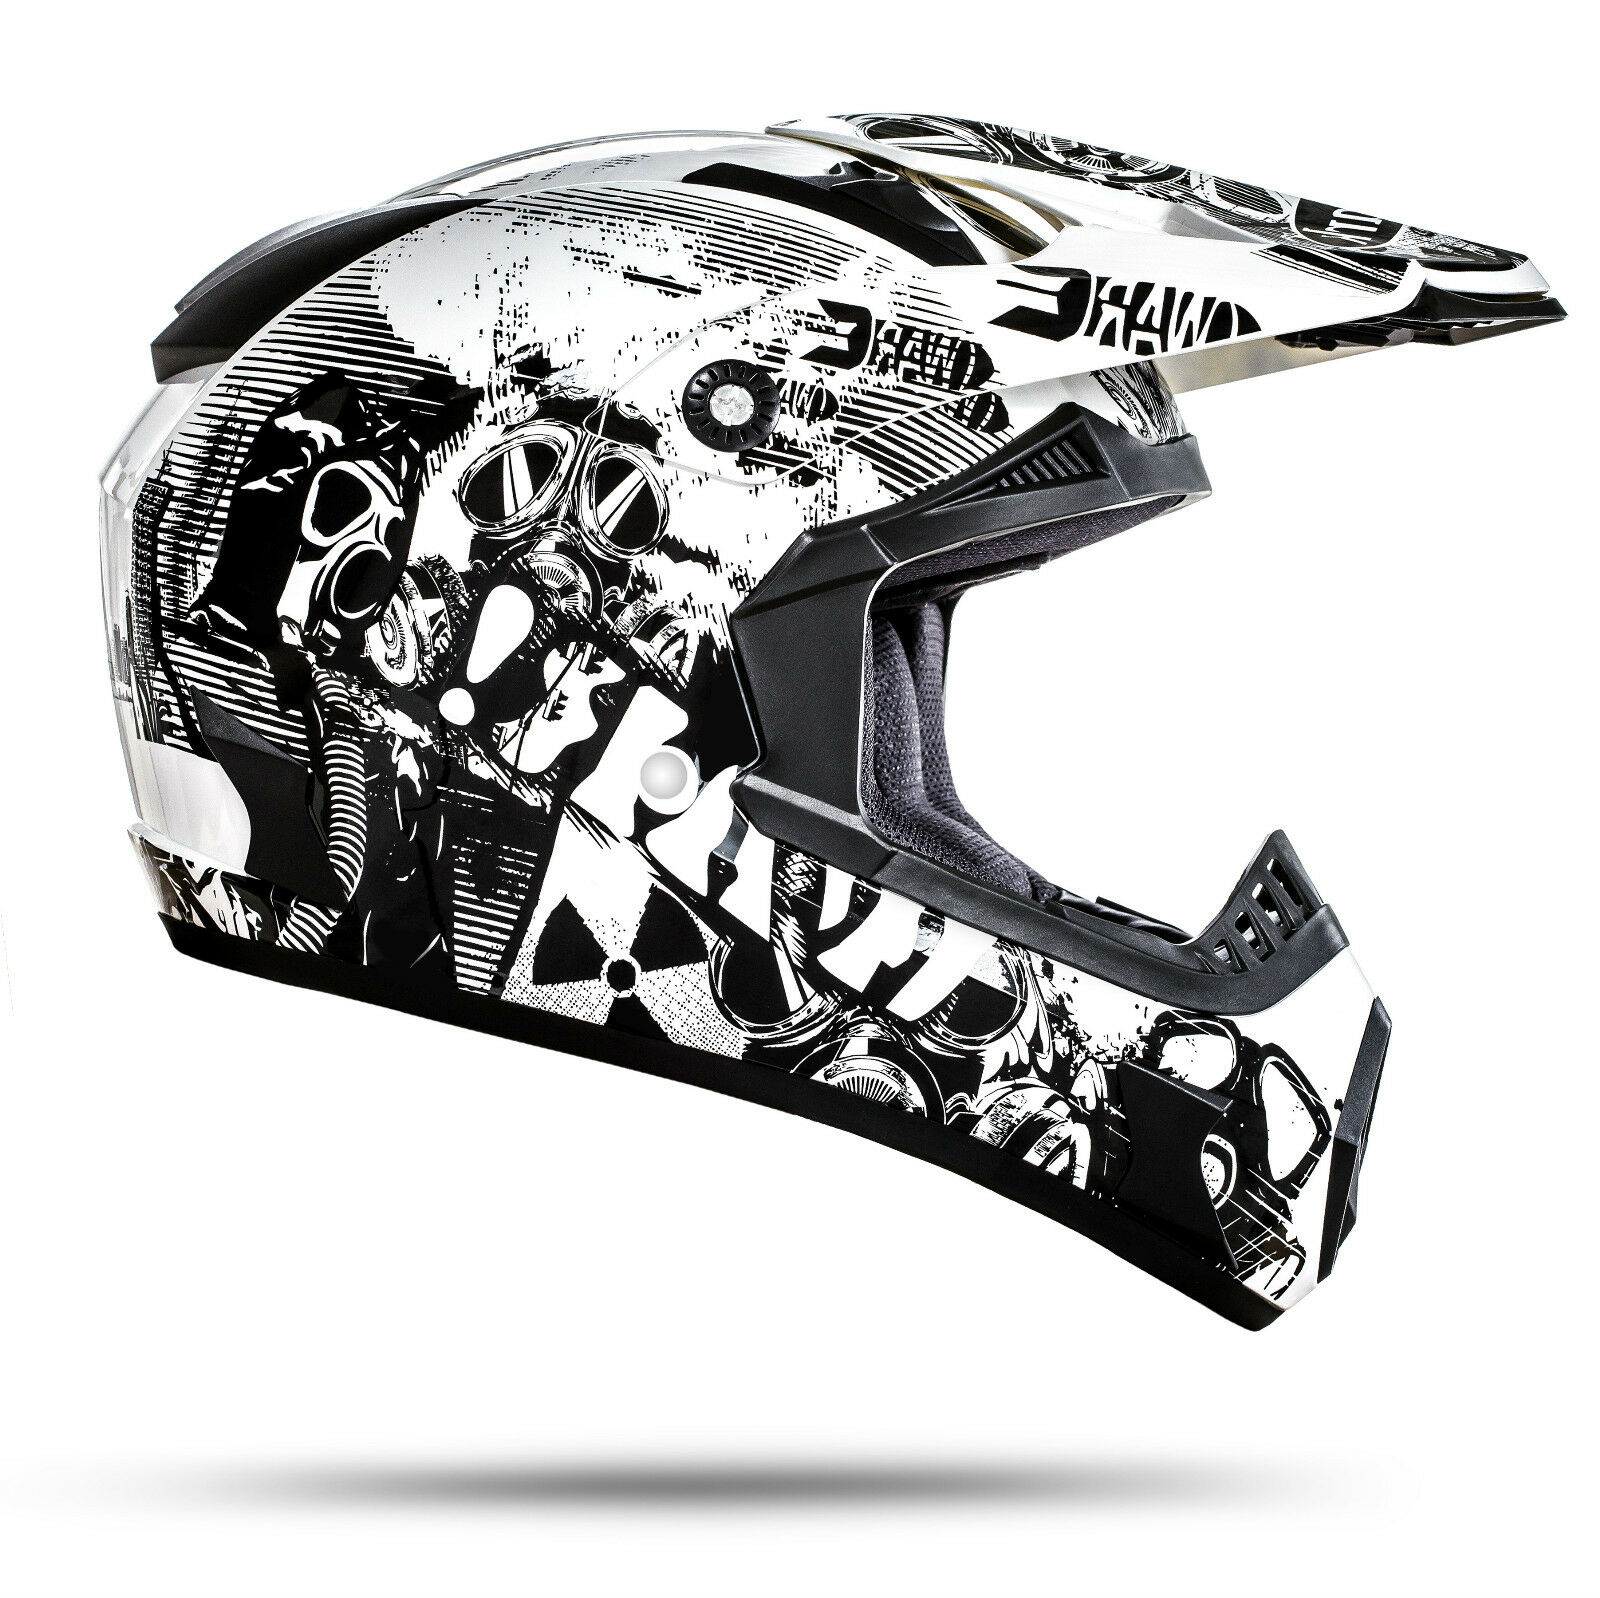 GS Nevada Motocross Helm Weiß Größe M ECE Norm Motorrad Enduro Quad Cross ATV